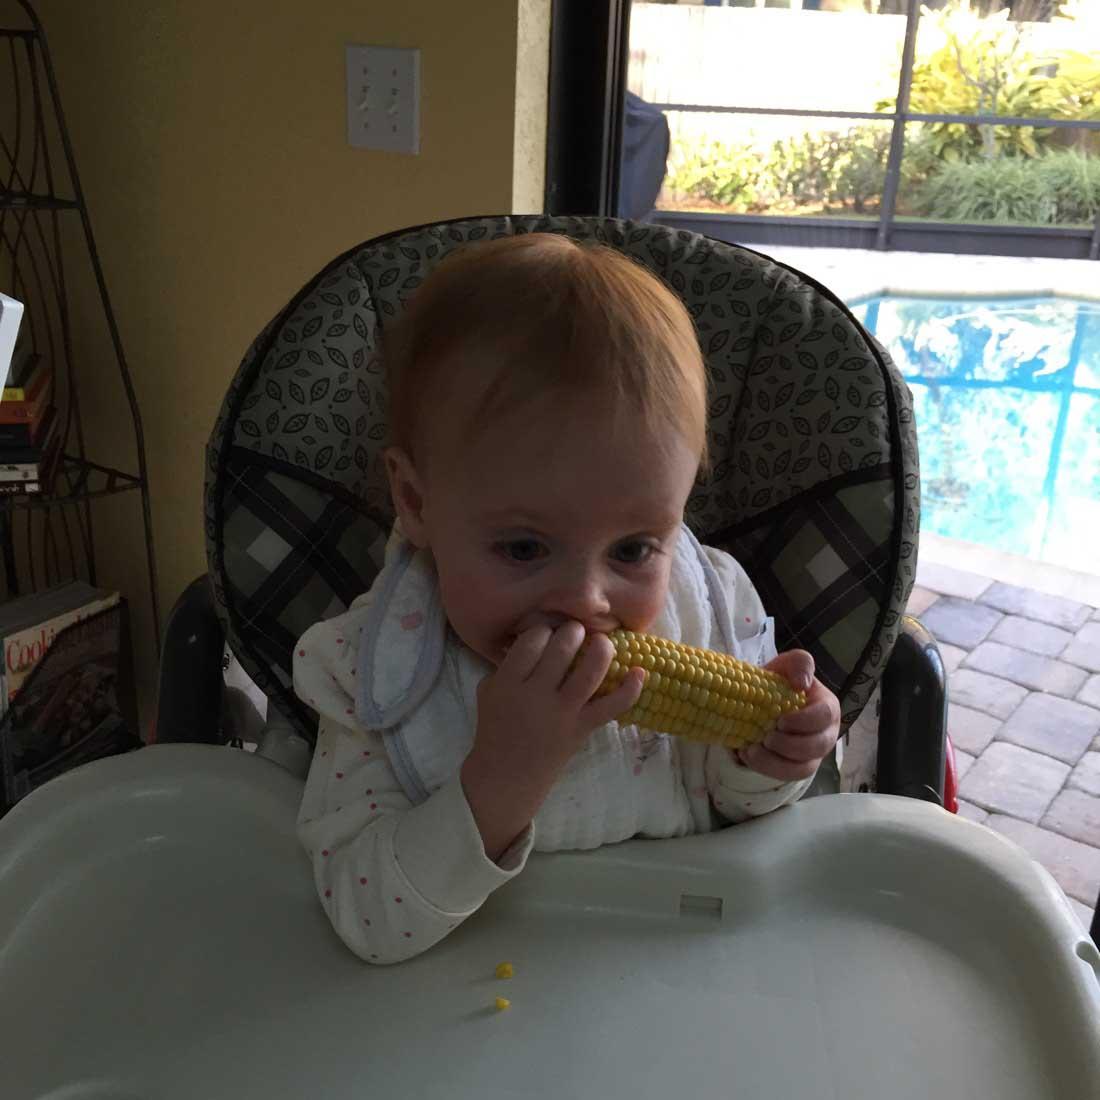 Devouring corn